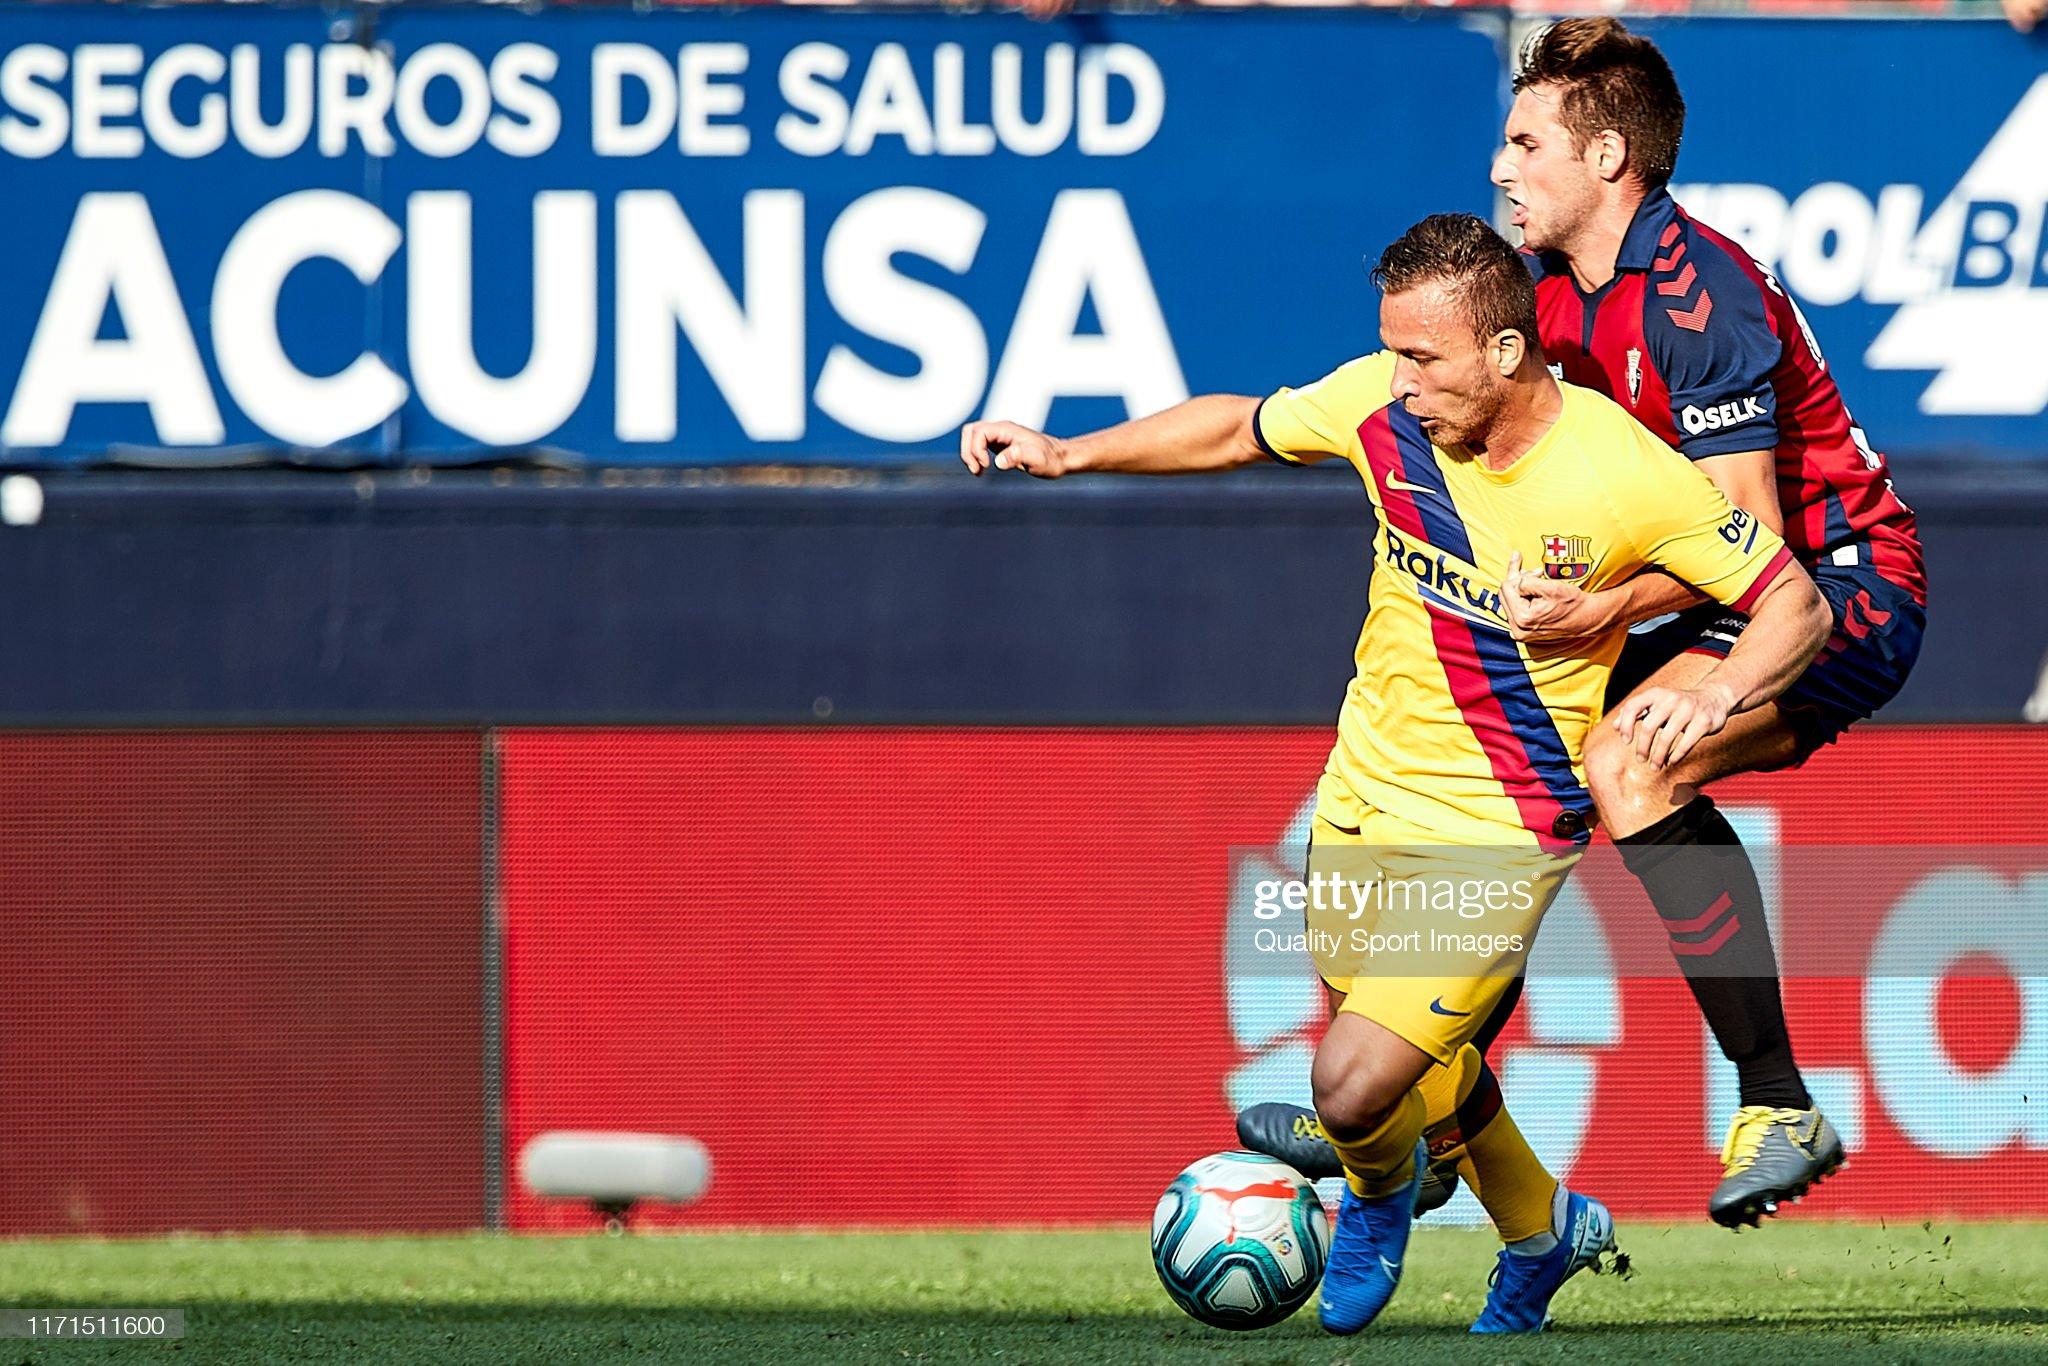 صور مباراة : أوساسونا - برشلونة 2-2 ( 31-08-2019 )  Moncayola-of-ca-osasuna-competes-for-the-ball-with-arthur-of-fc-the-picture-id1171511600?s=2048x2048